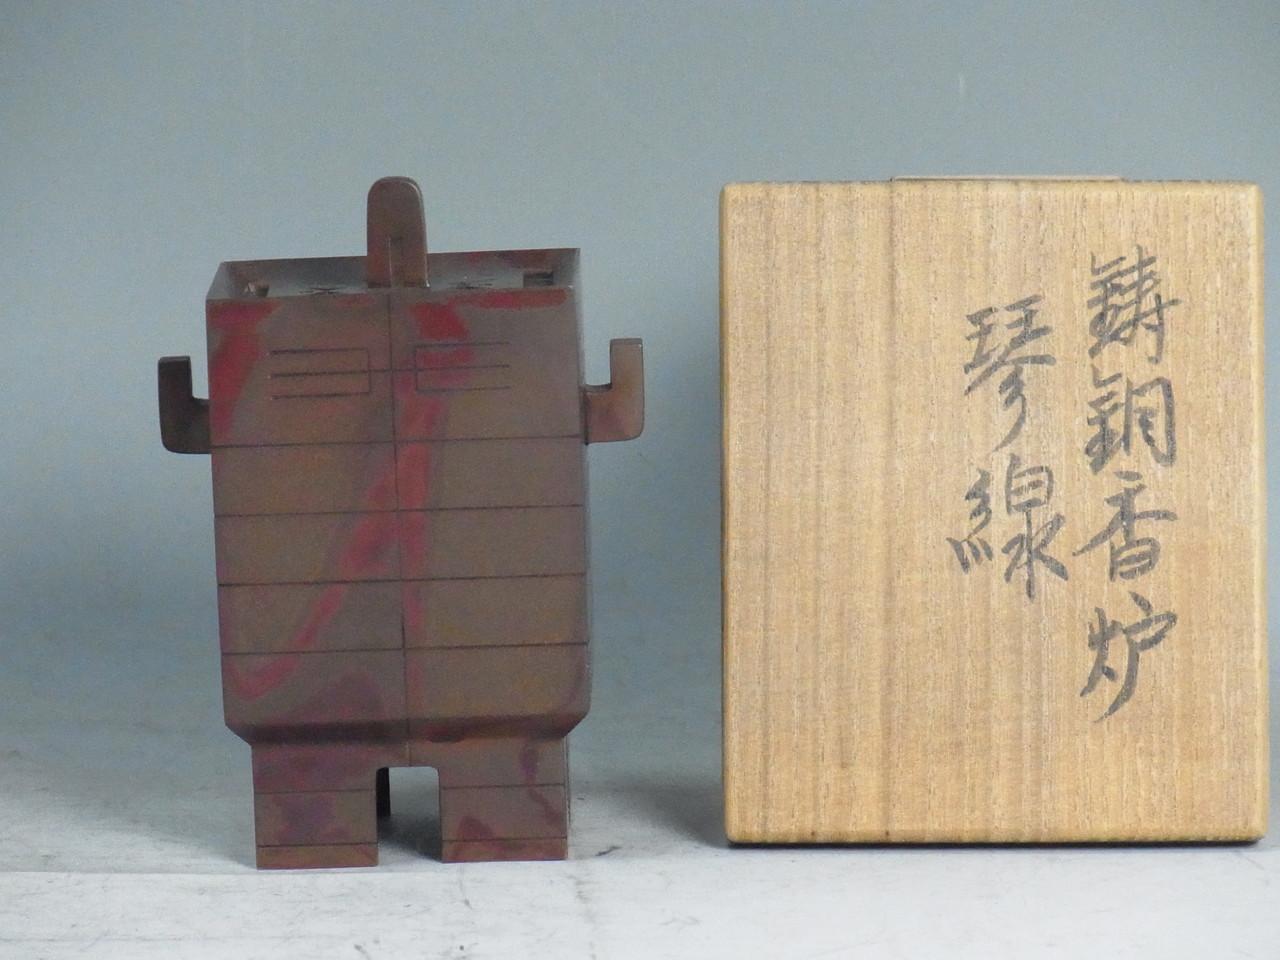 C04.蓮田修吾郎 鋳銅香炉 琴線 - 高岡銅器展示館